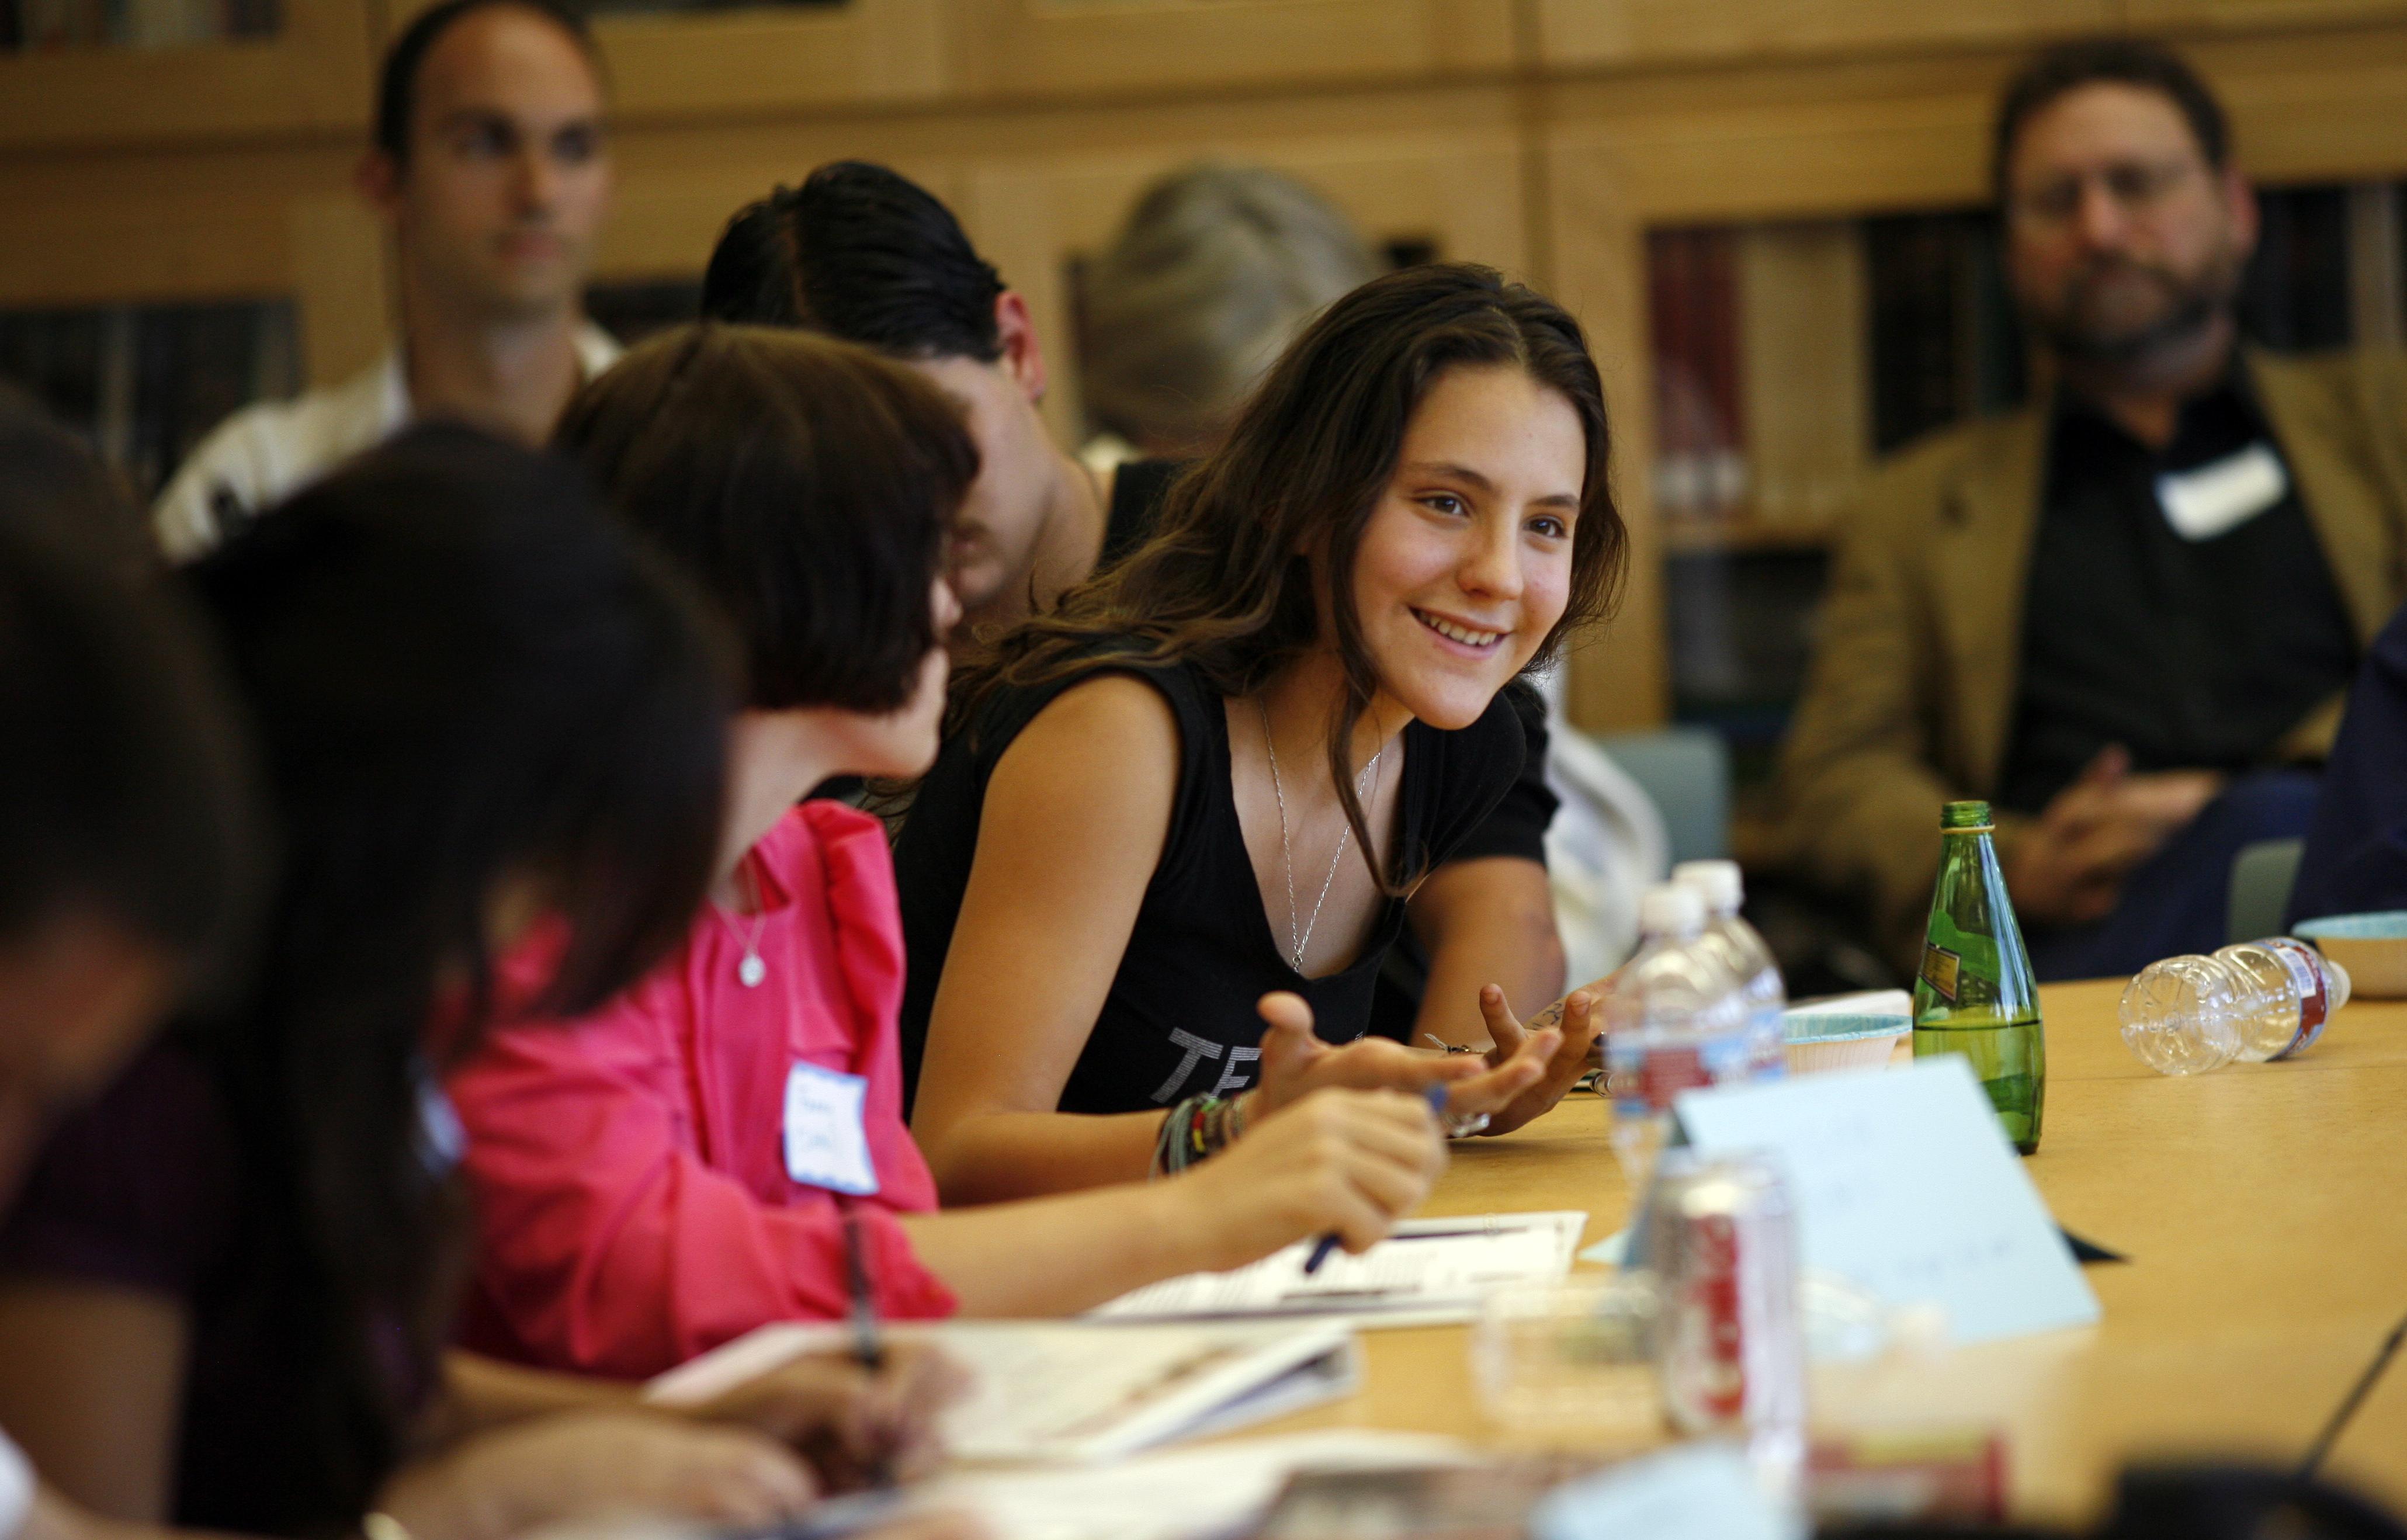 HRW Student Task Force leadership training at UCLA.